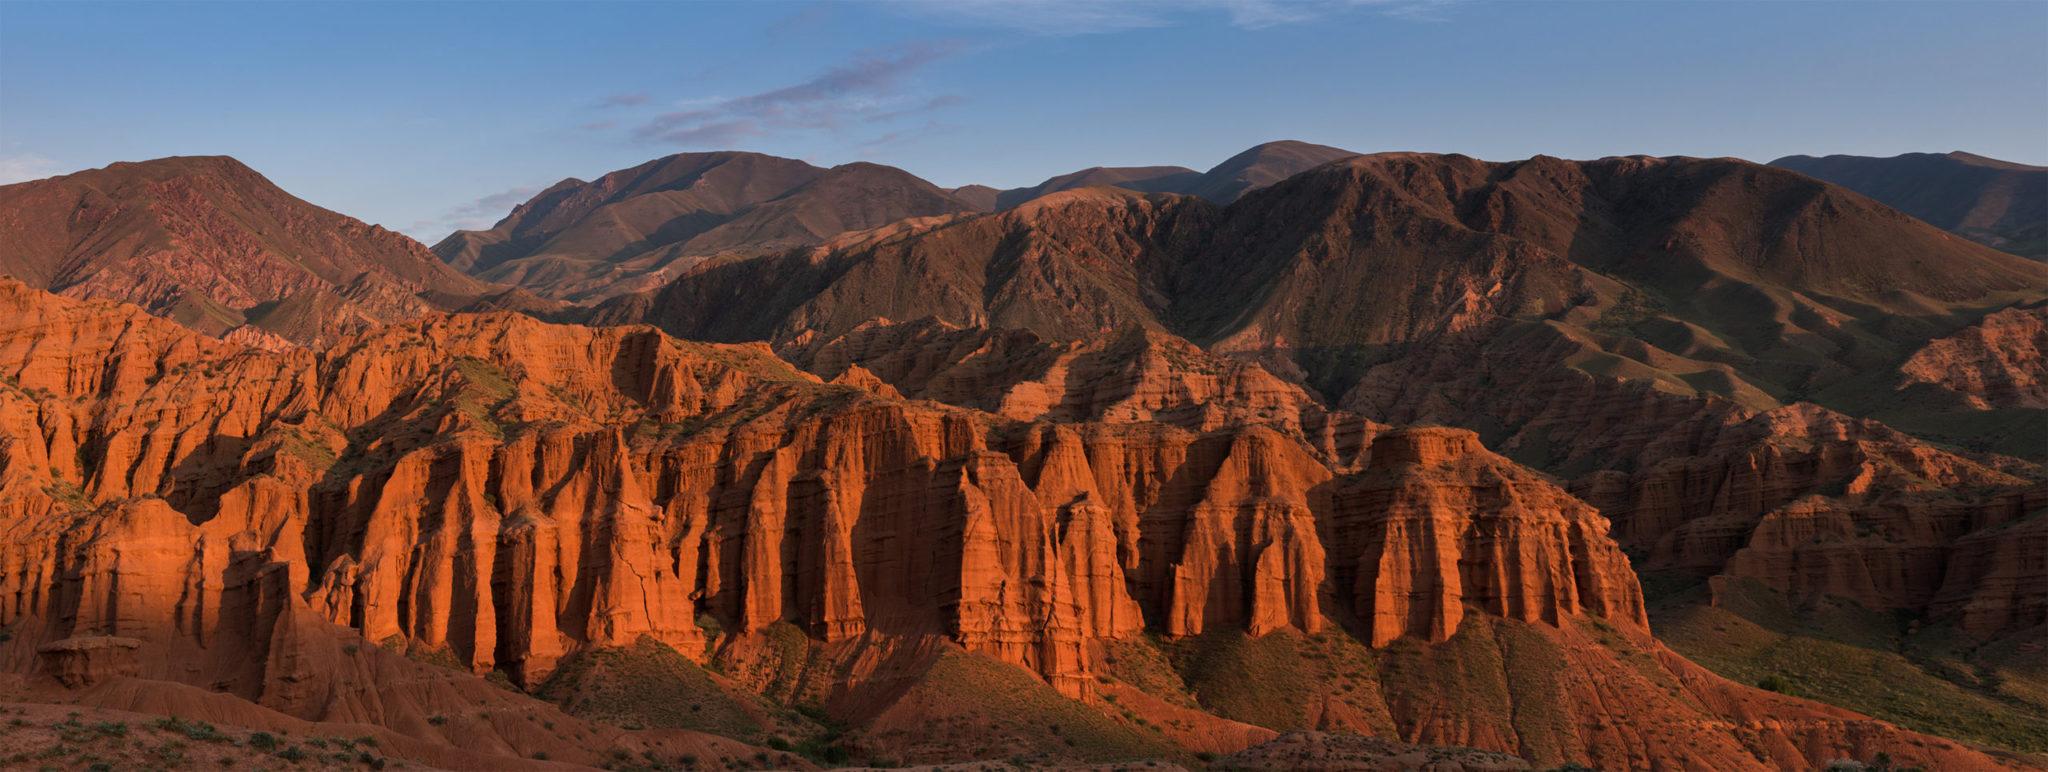 Kyrgyzstan trekking holiday: Konorchek Red Bridge Canyons trek